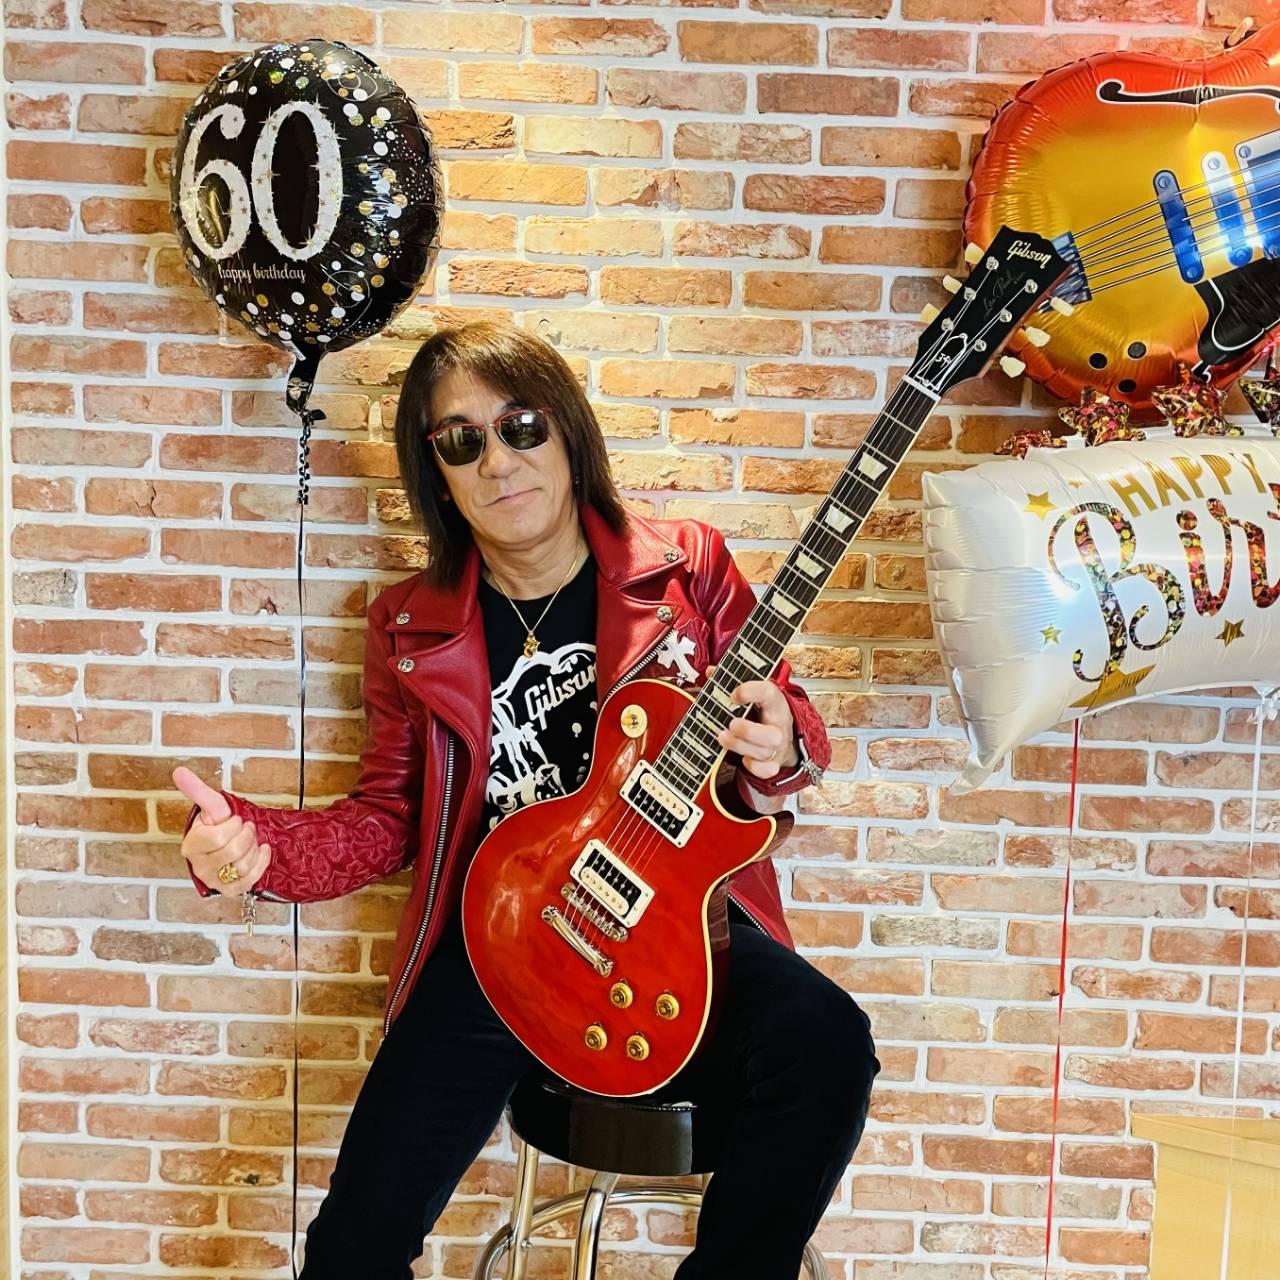 B'z松本孝弘が60歳・還暦を迎えた写真